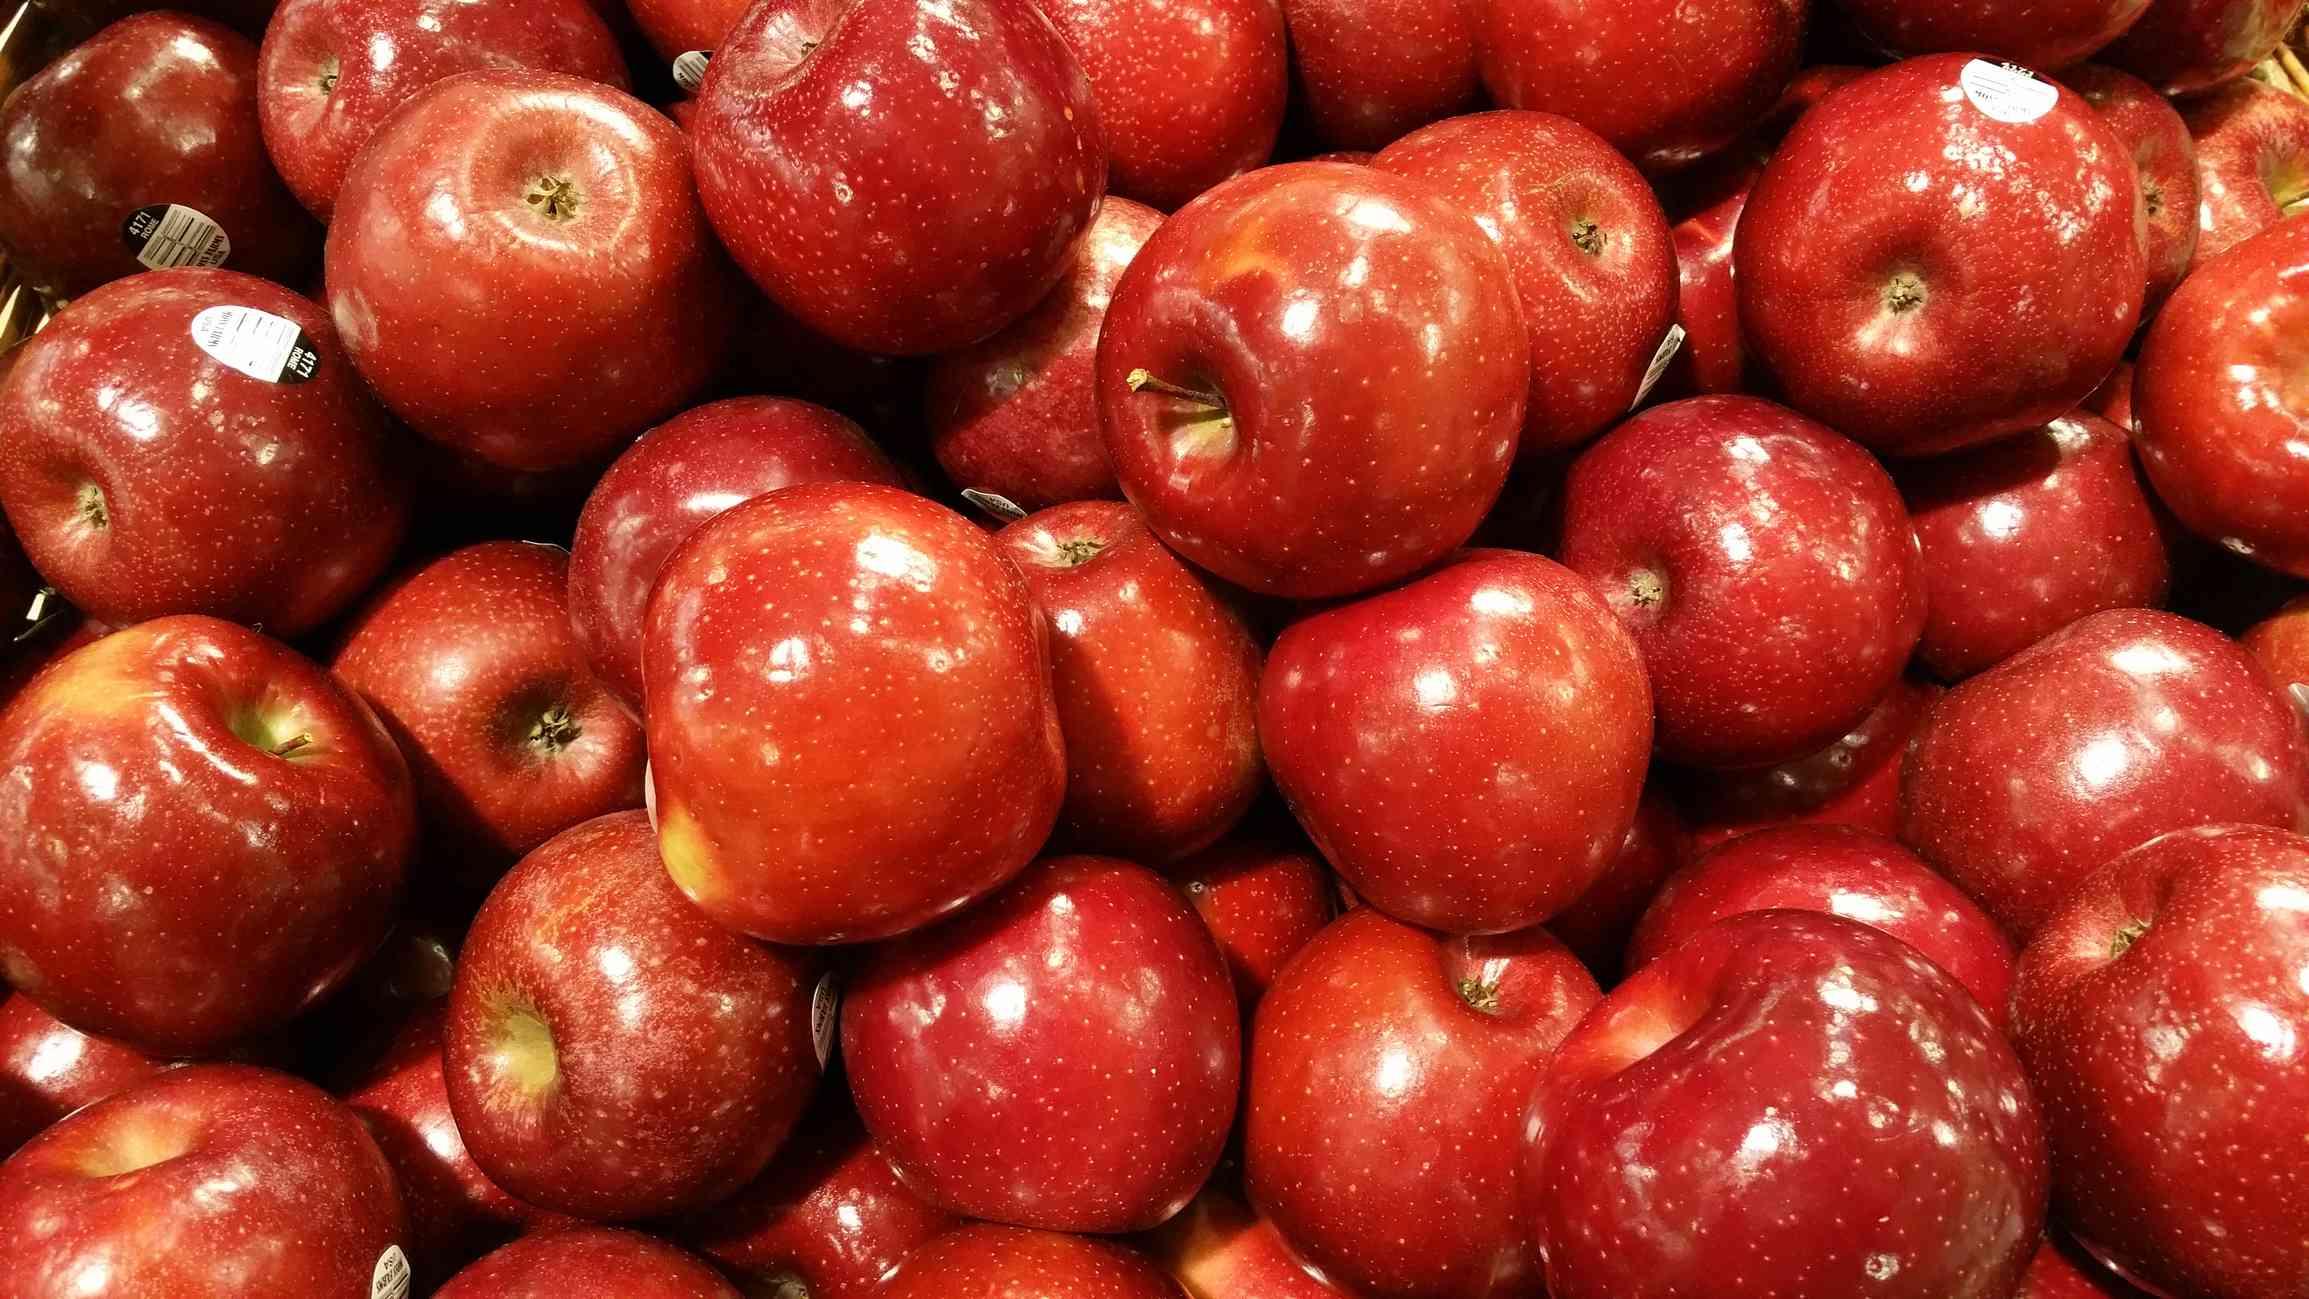 Rome Beauty Apples